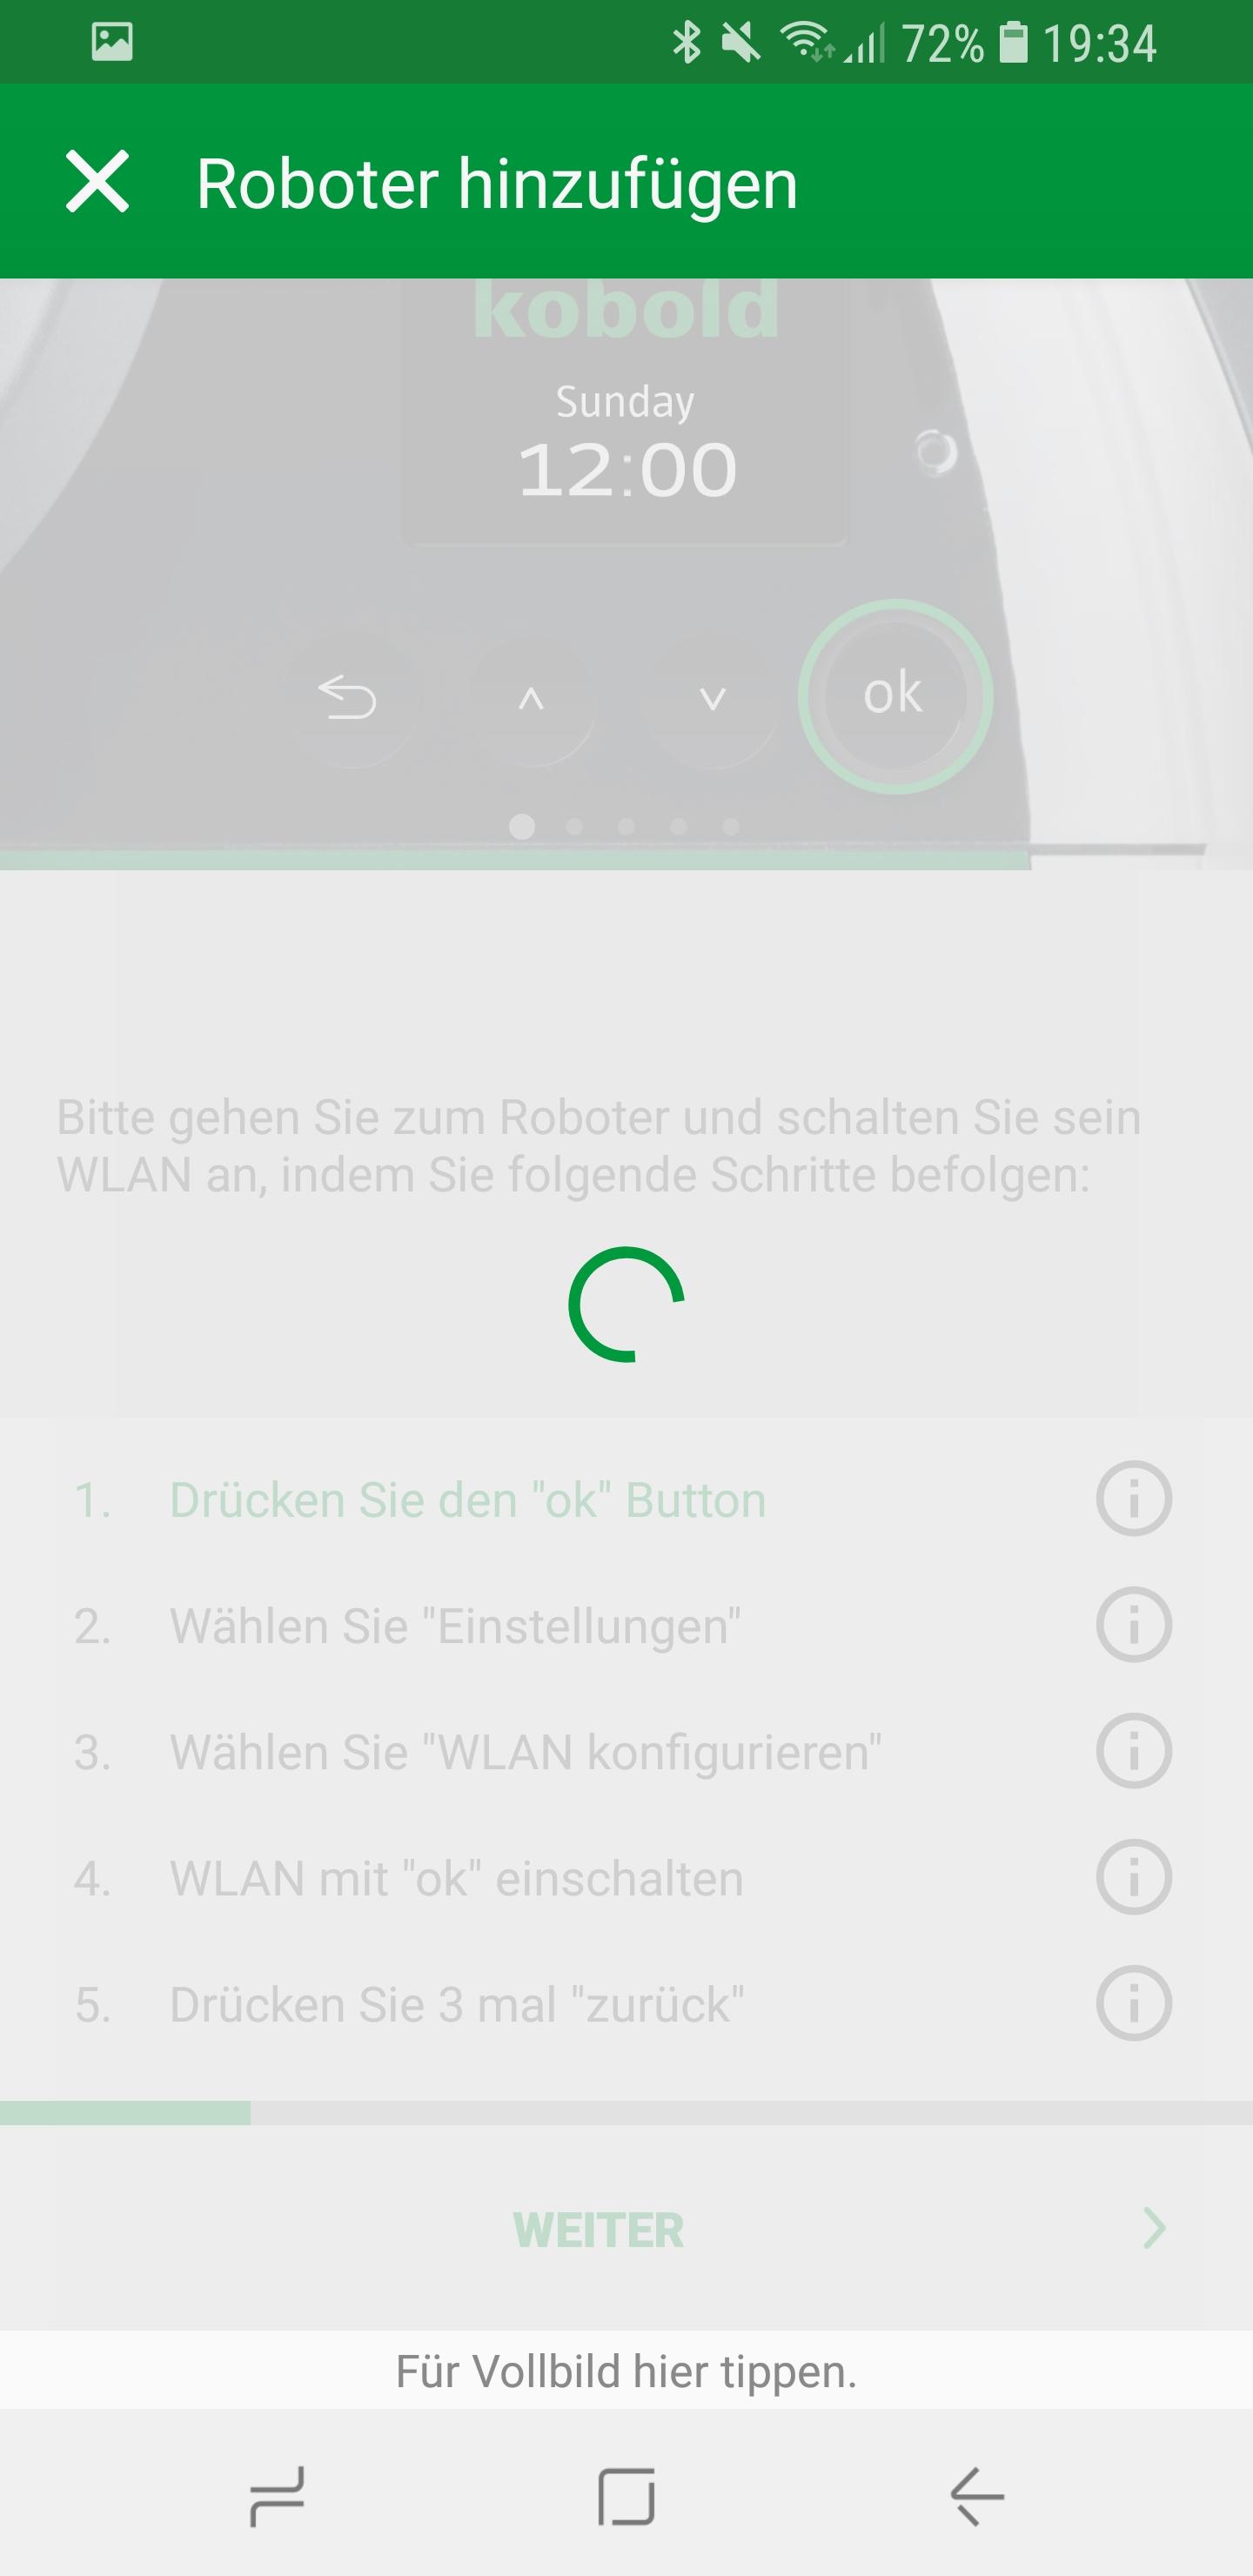 Vorwerk Kobold App Roboter hinzufügen 03